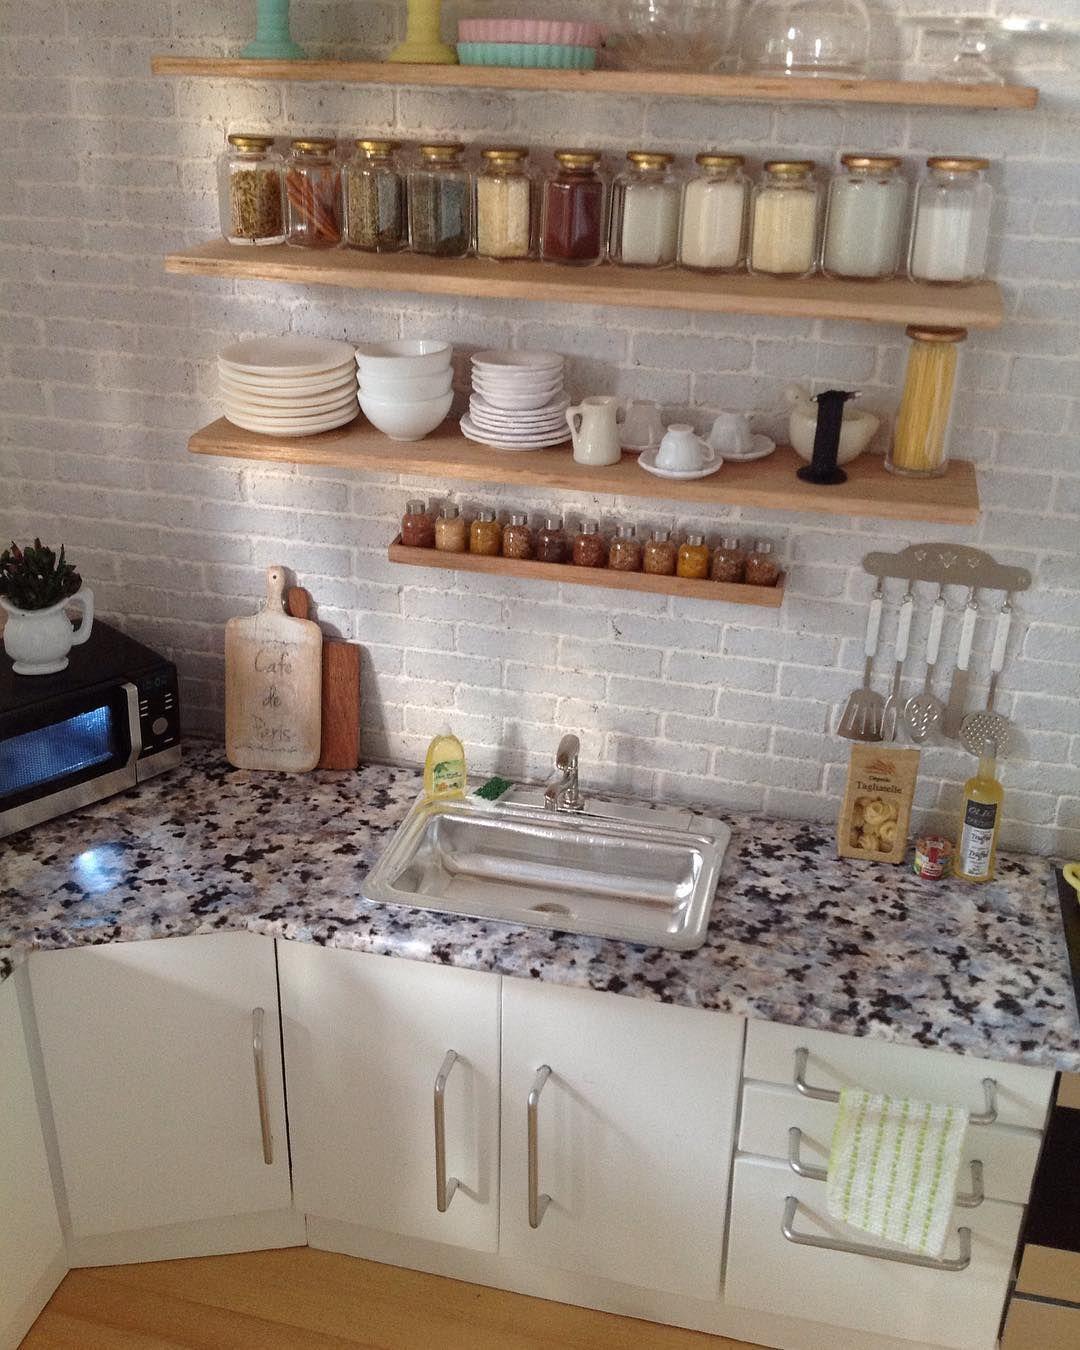 2017 Miniature Kitchen By Almadejonge Miniature Kitchen Dolls House Interiors Mini Kitchen